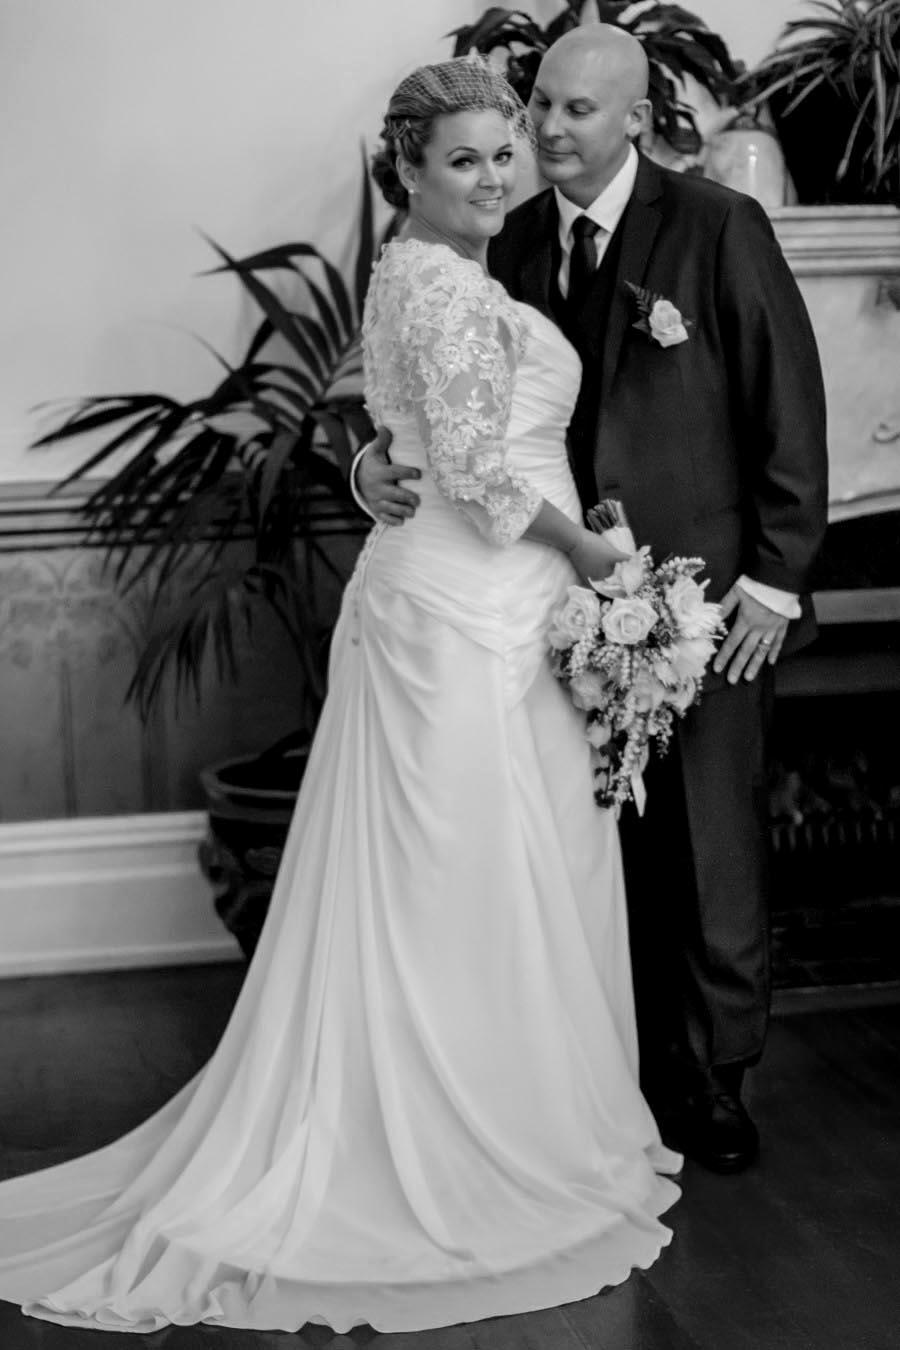 nz_wedding_st_leonards_mchughs-777